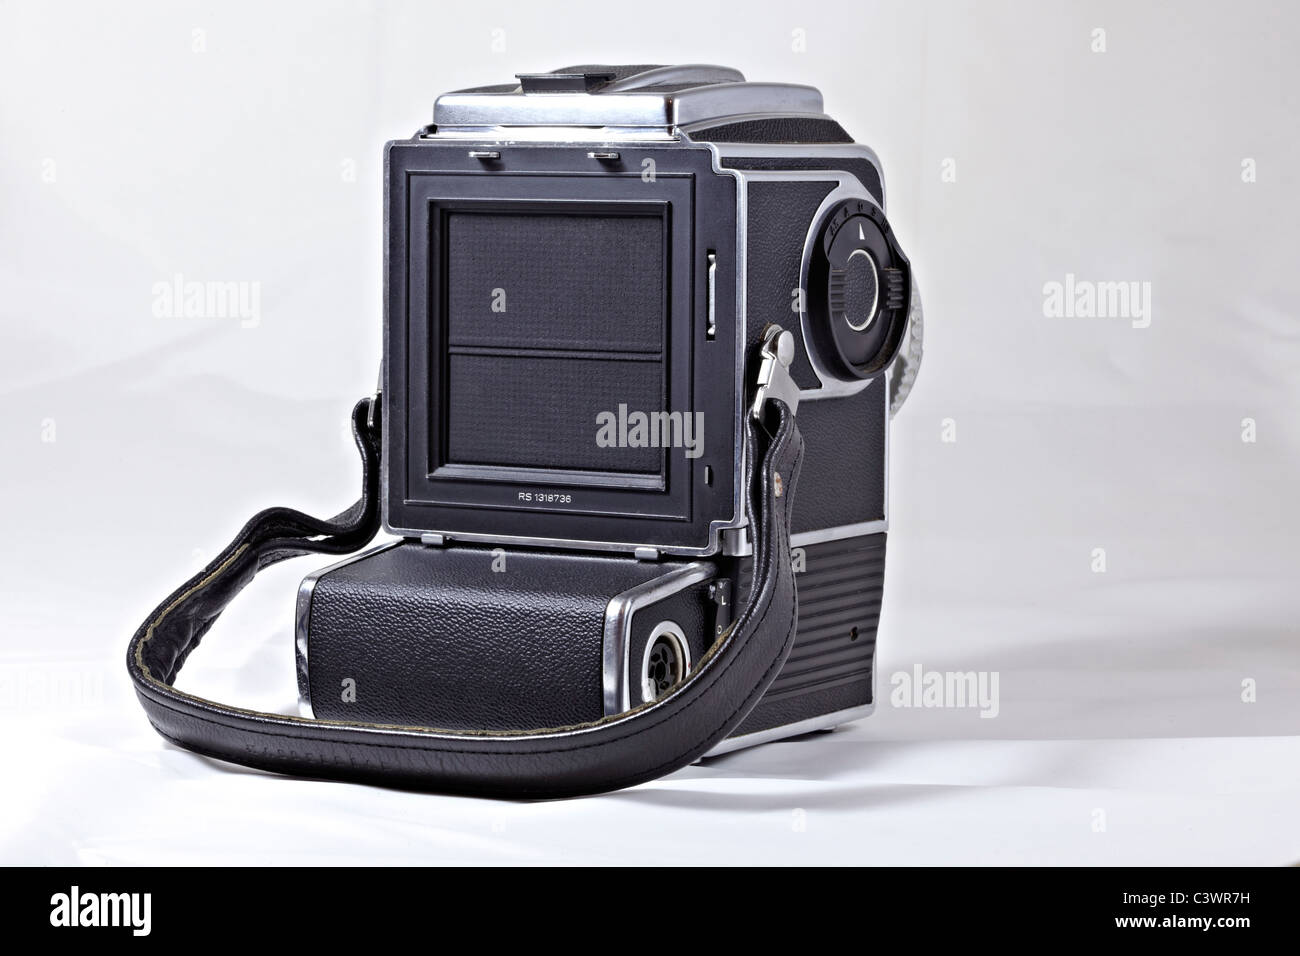 Hasselblad 500 Camera Stock Photos & Hasselblad 500 Camera